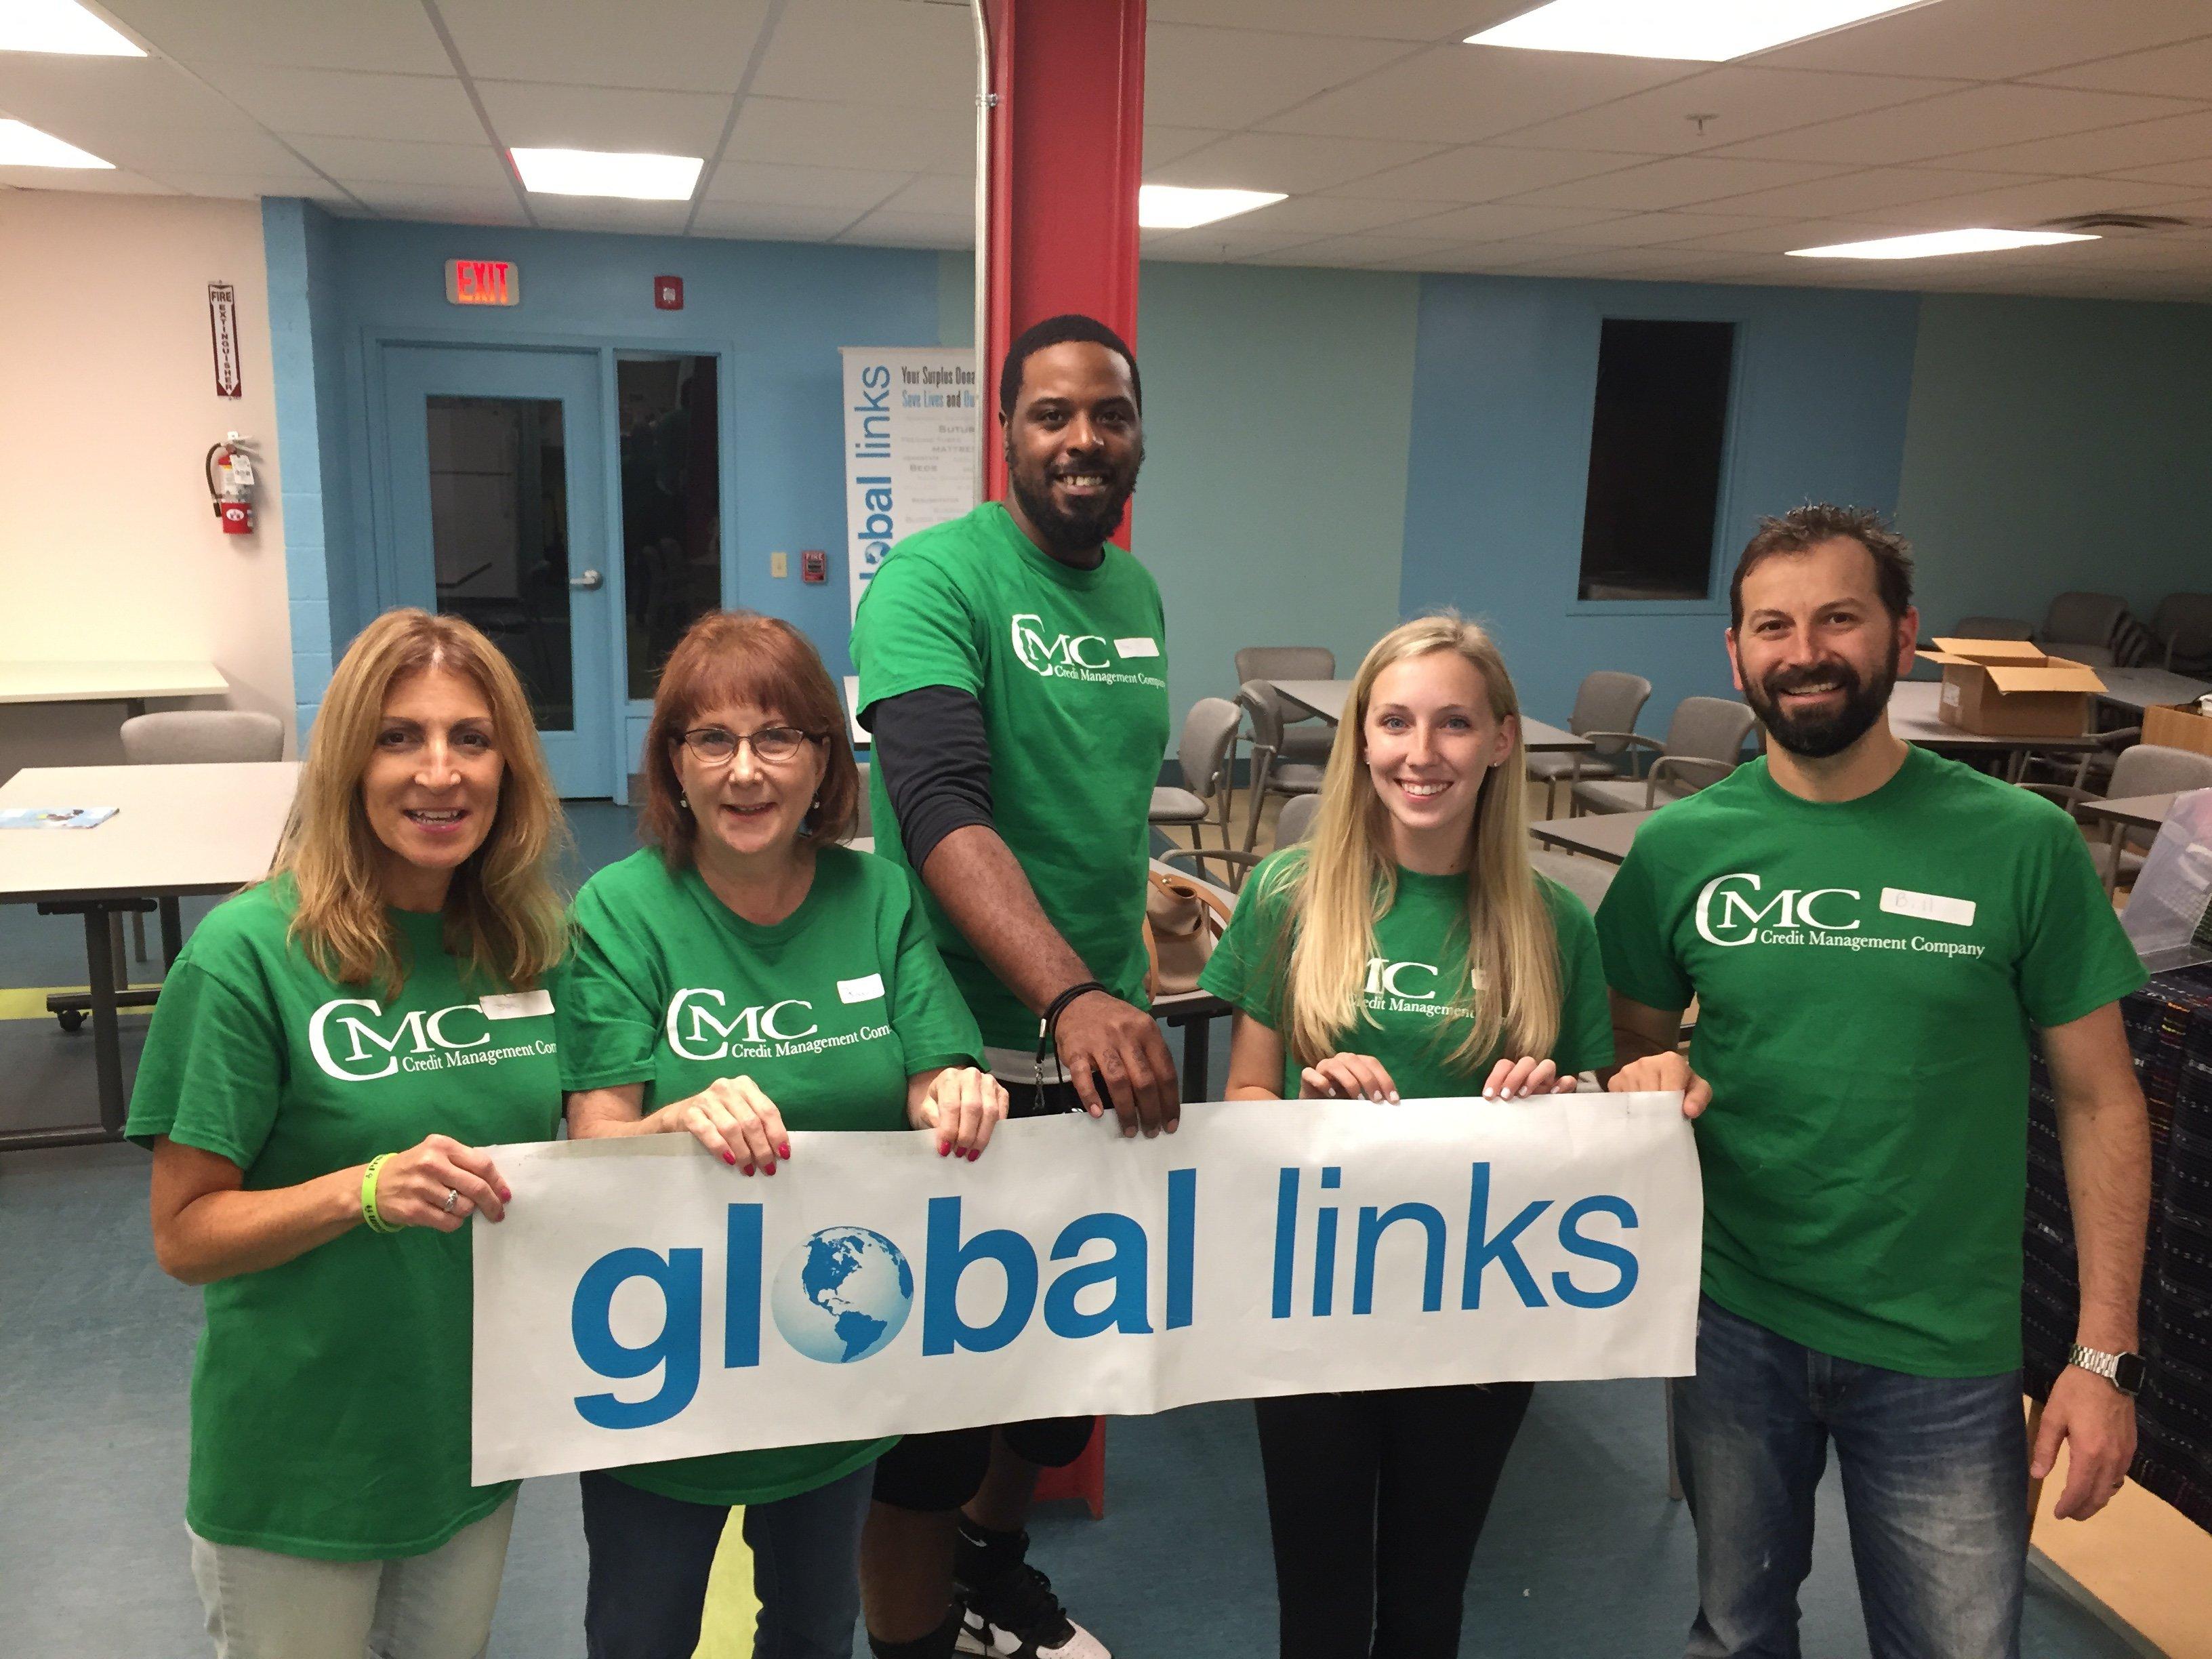 Global Links - logo